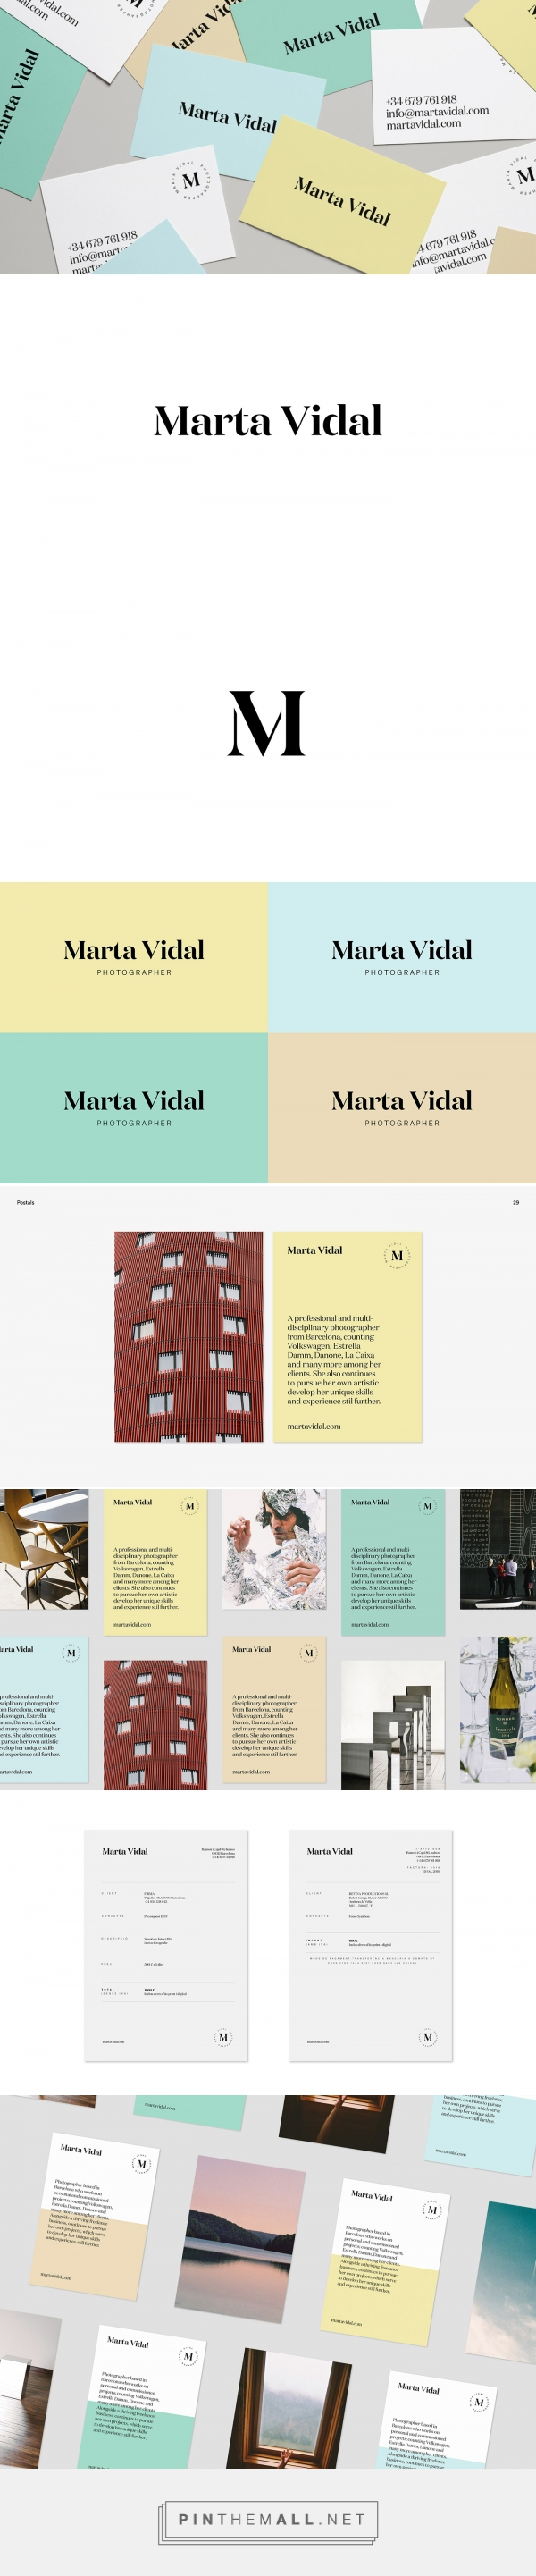 Marta Vidal Photographer Identity - Mindsparkle Mag - created via https://pinthemall.net